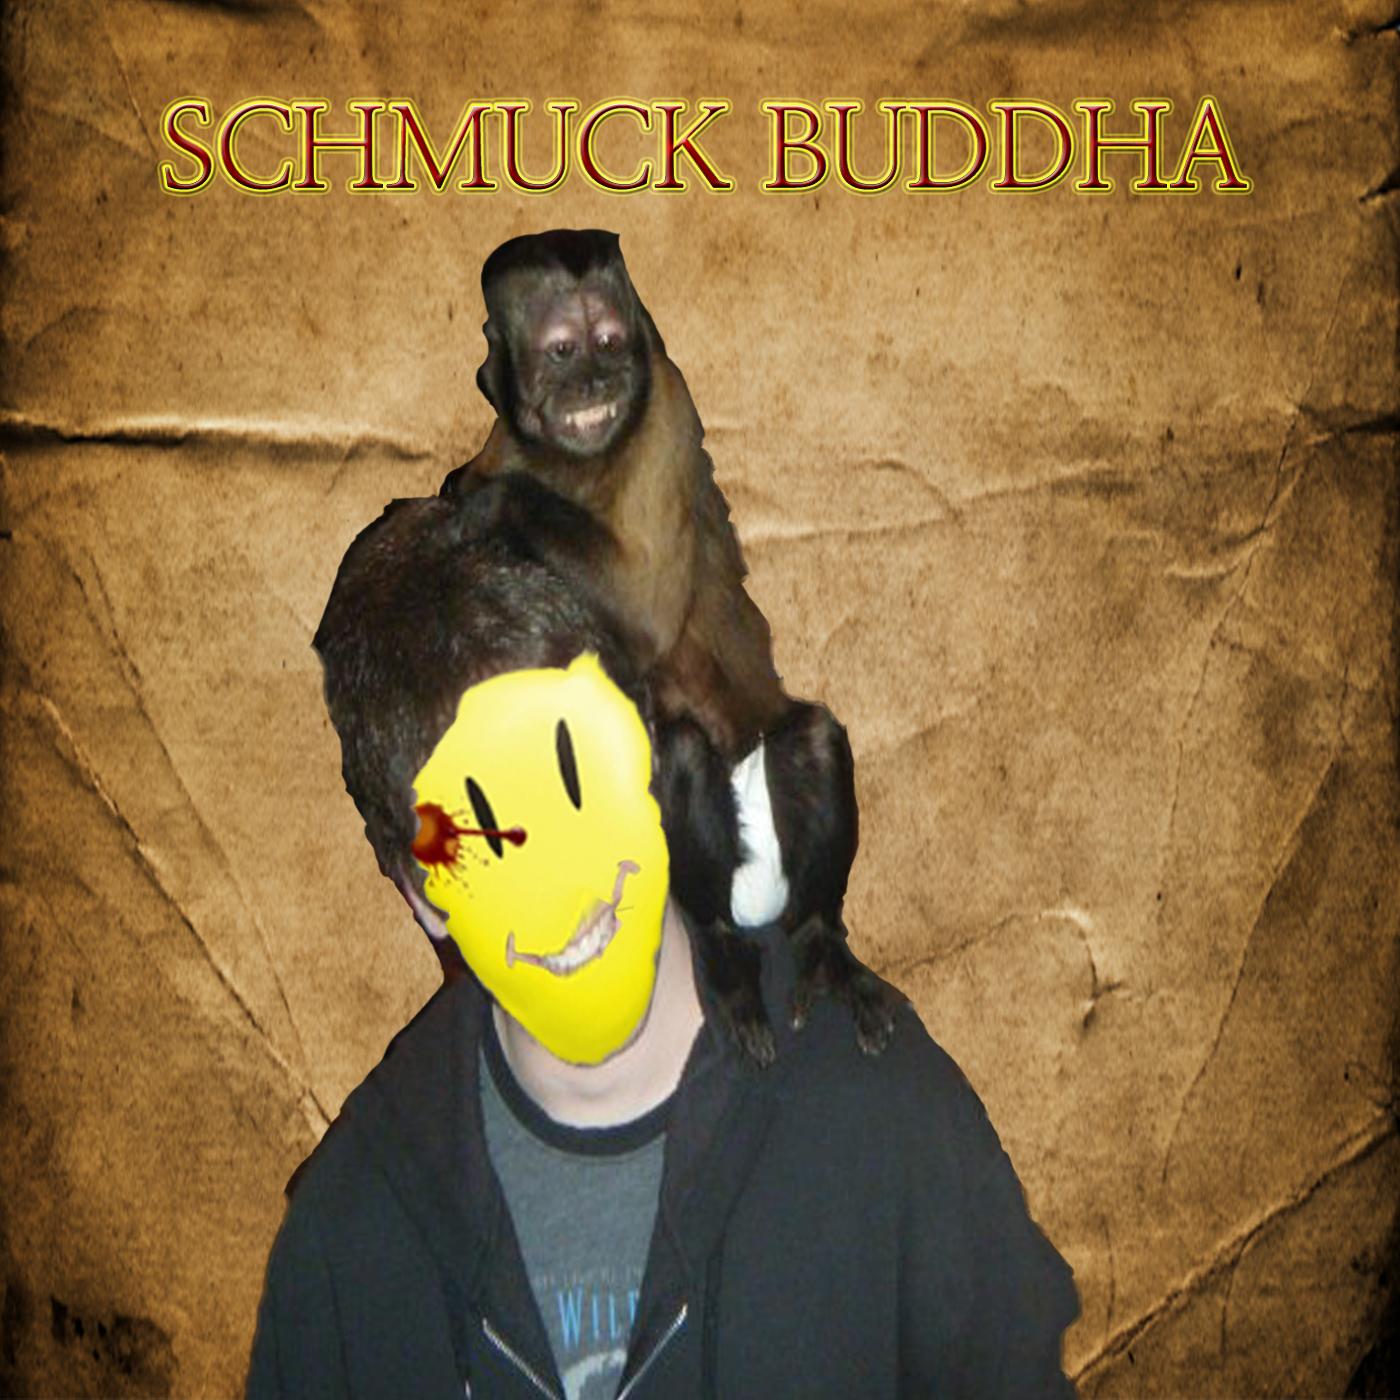 Schmuck Buddha